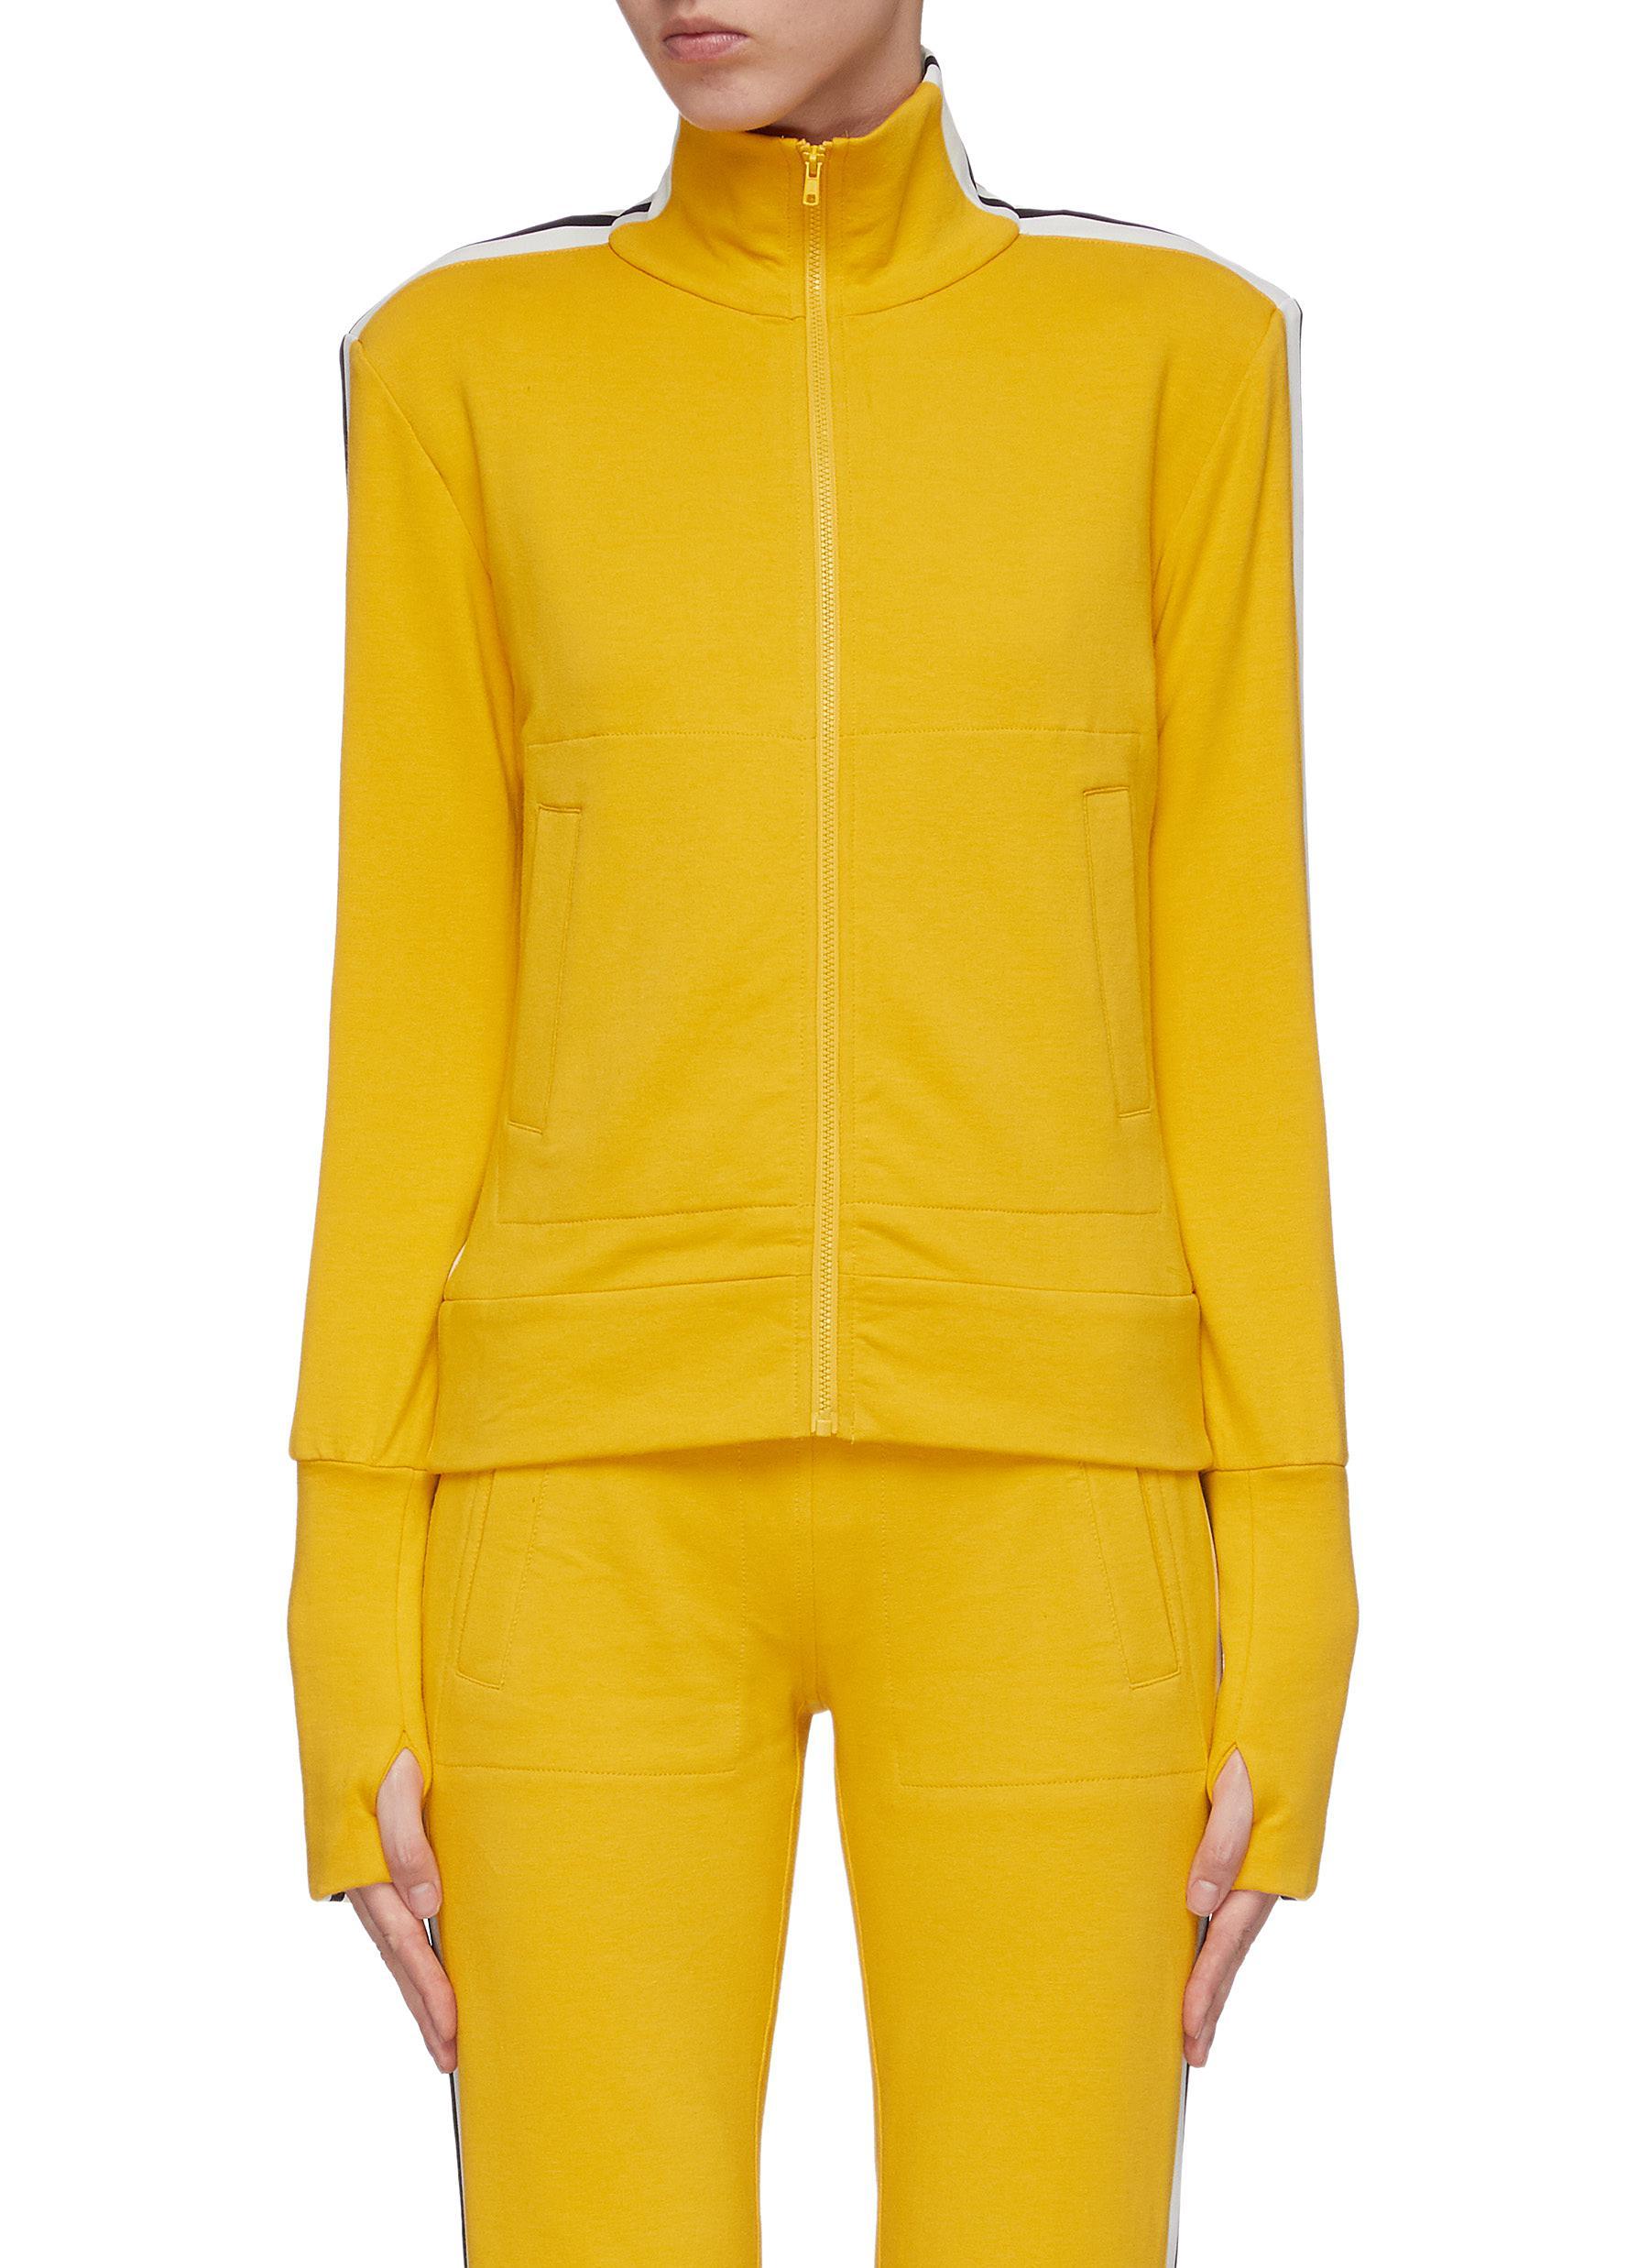 Stripe sleeve turtleneck track jacket by Norma Kamali